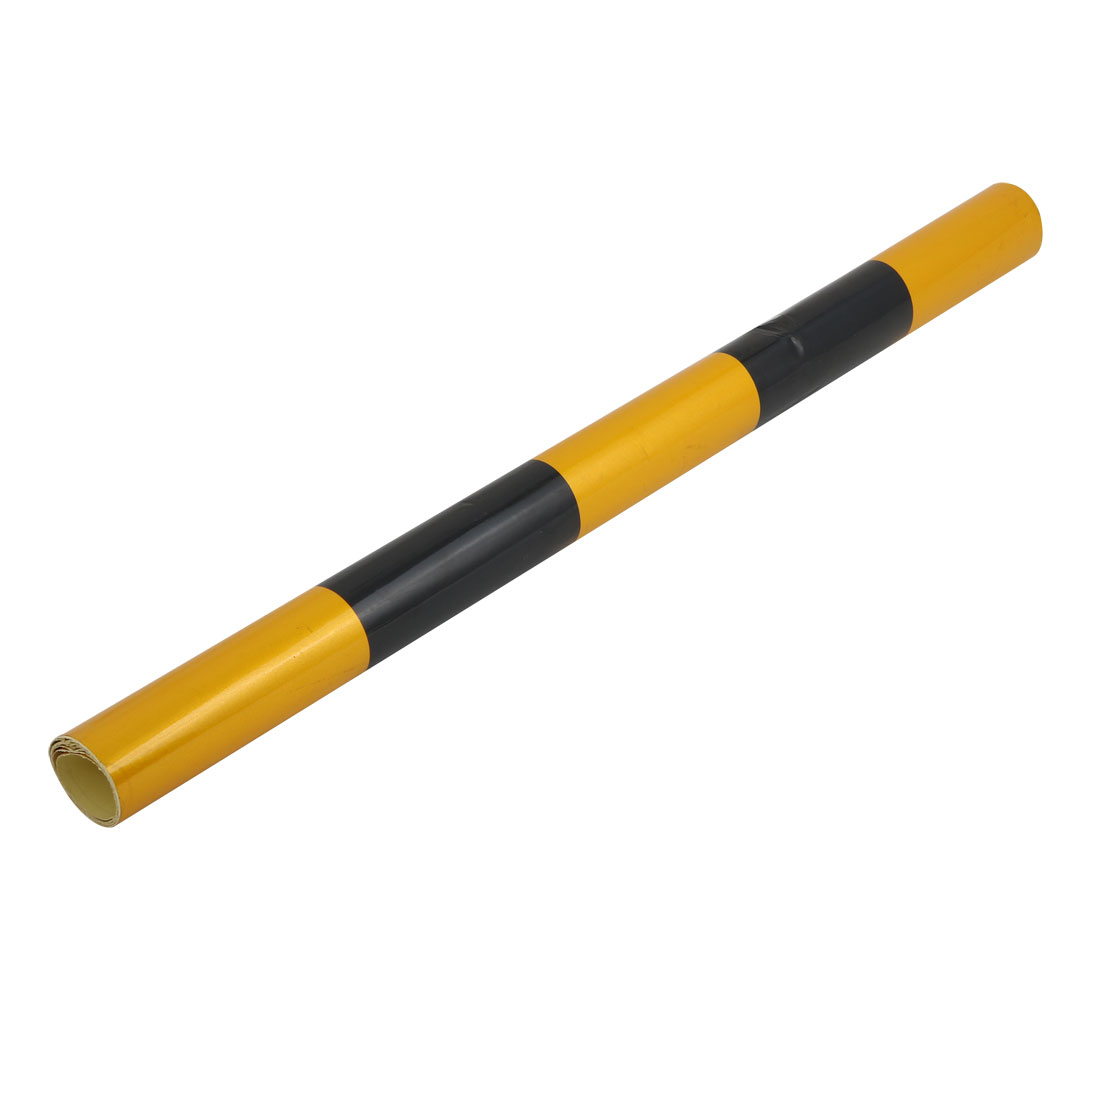 60cm Width 1M Length Single Sided Adhesive Reflective Warning Tape Black Yellow